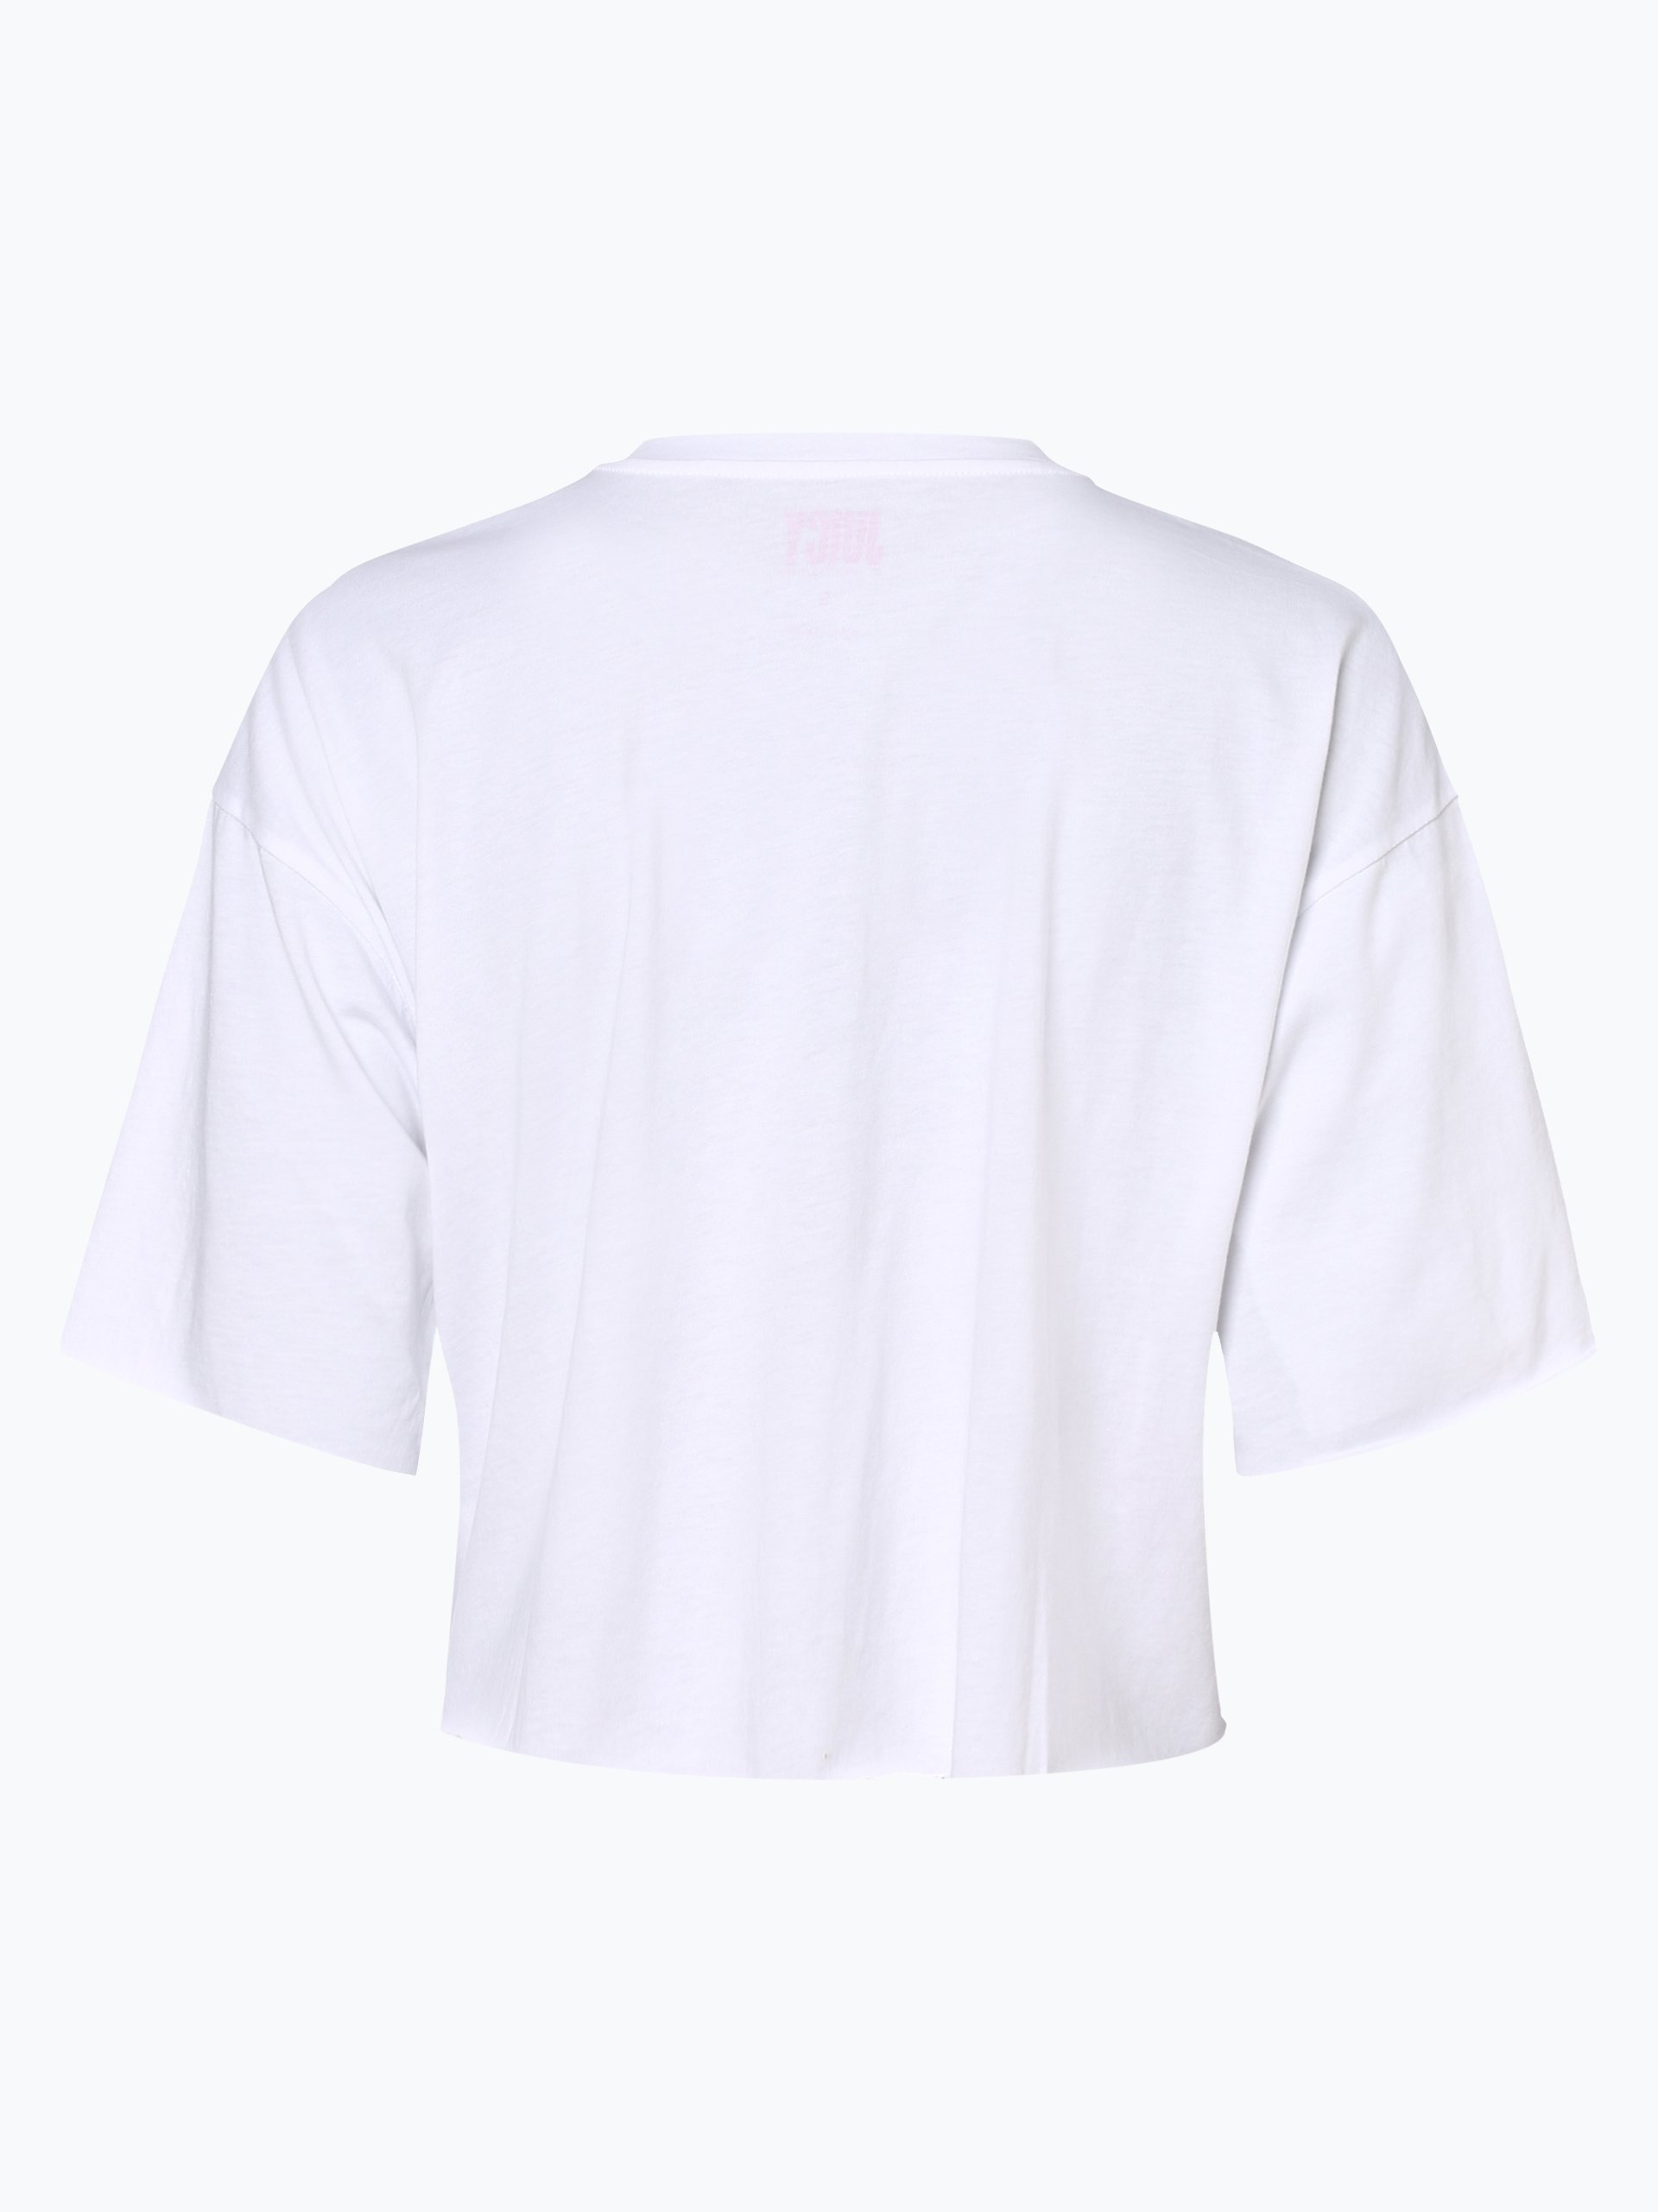 Juicy by Juicy Couture Damen T-Shirt